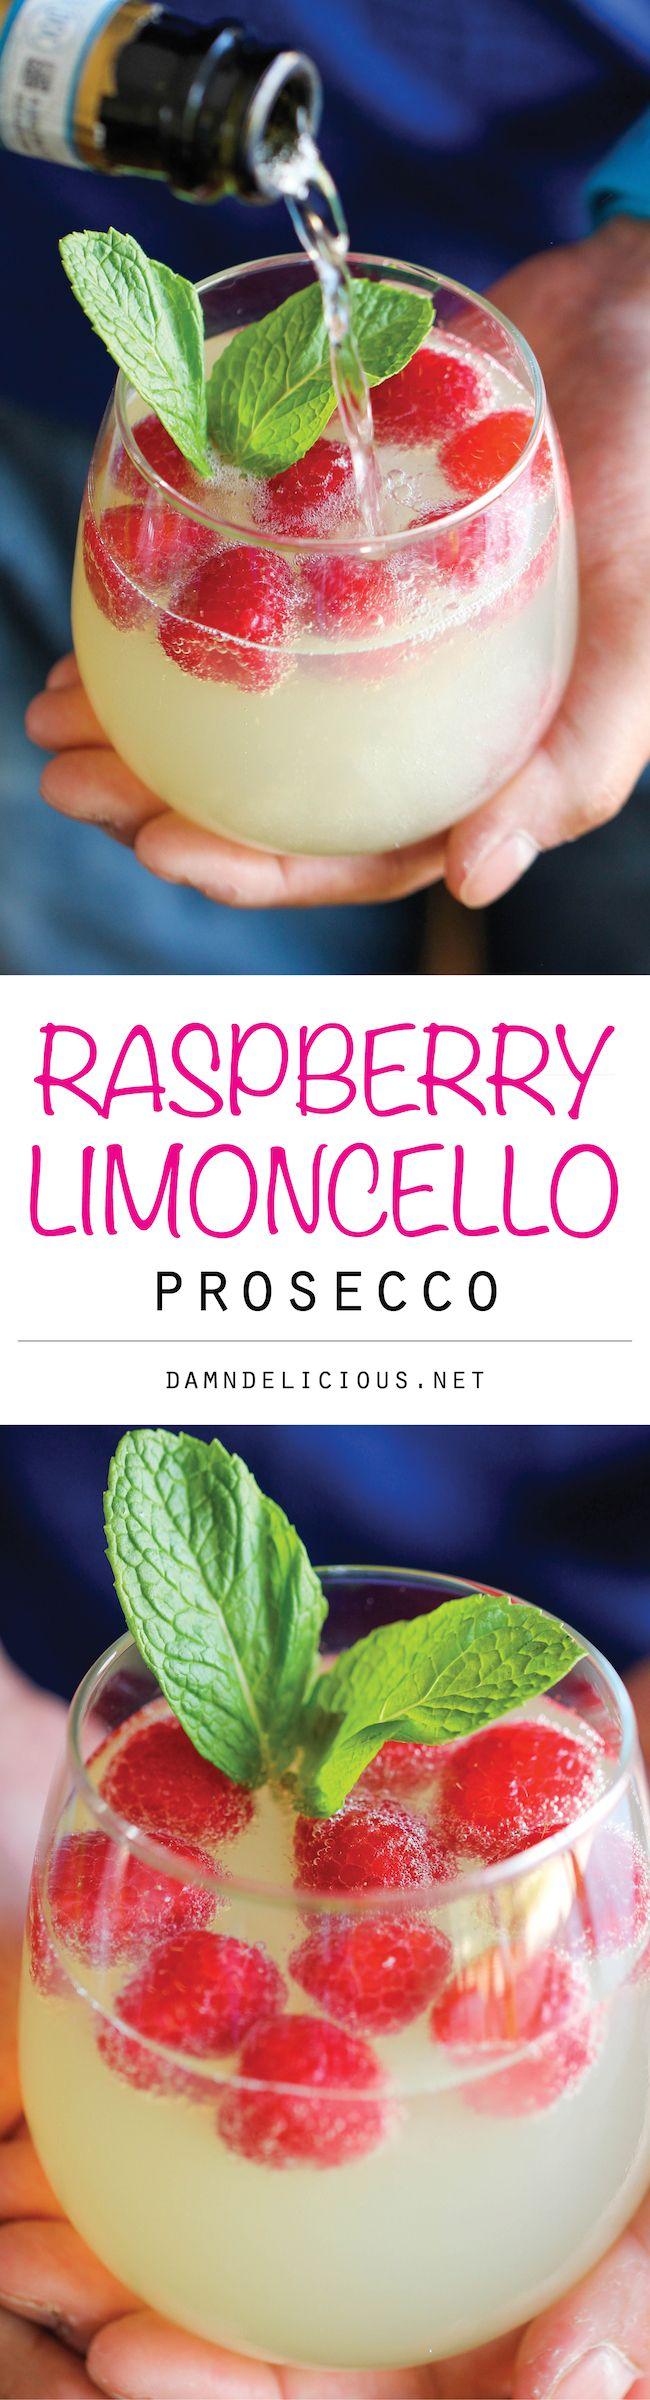 raspberry limoncello prosecco rezept appetizers brunch casseroles pinterest getr nke. Black Bedroom Furniture Sets. Home Design Ideas